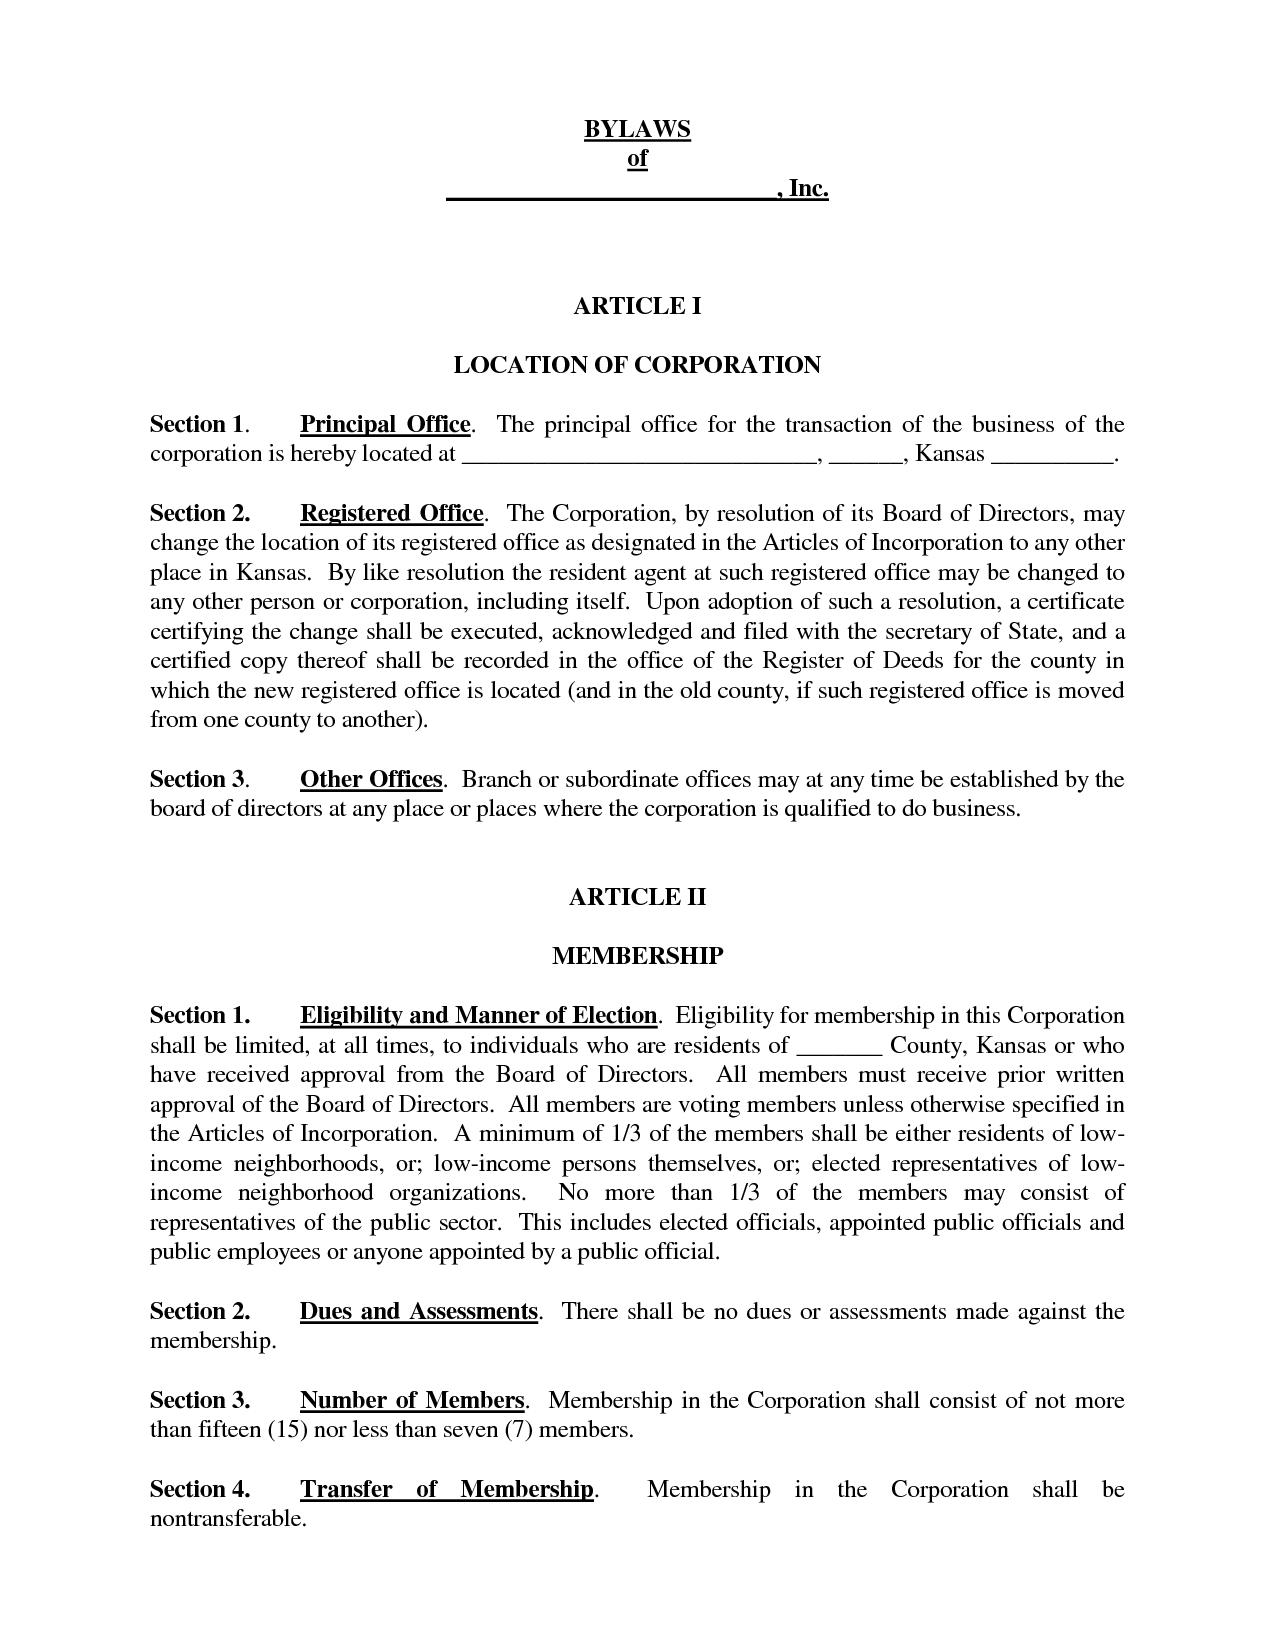 Doc623554 Bylaw Template Nonprofit Bylaws 76 Similar Docs – Bylaw Template